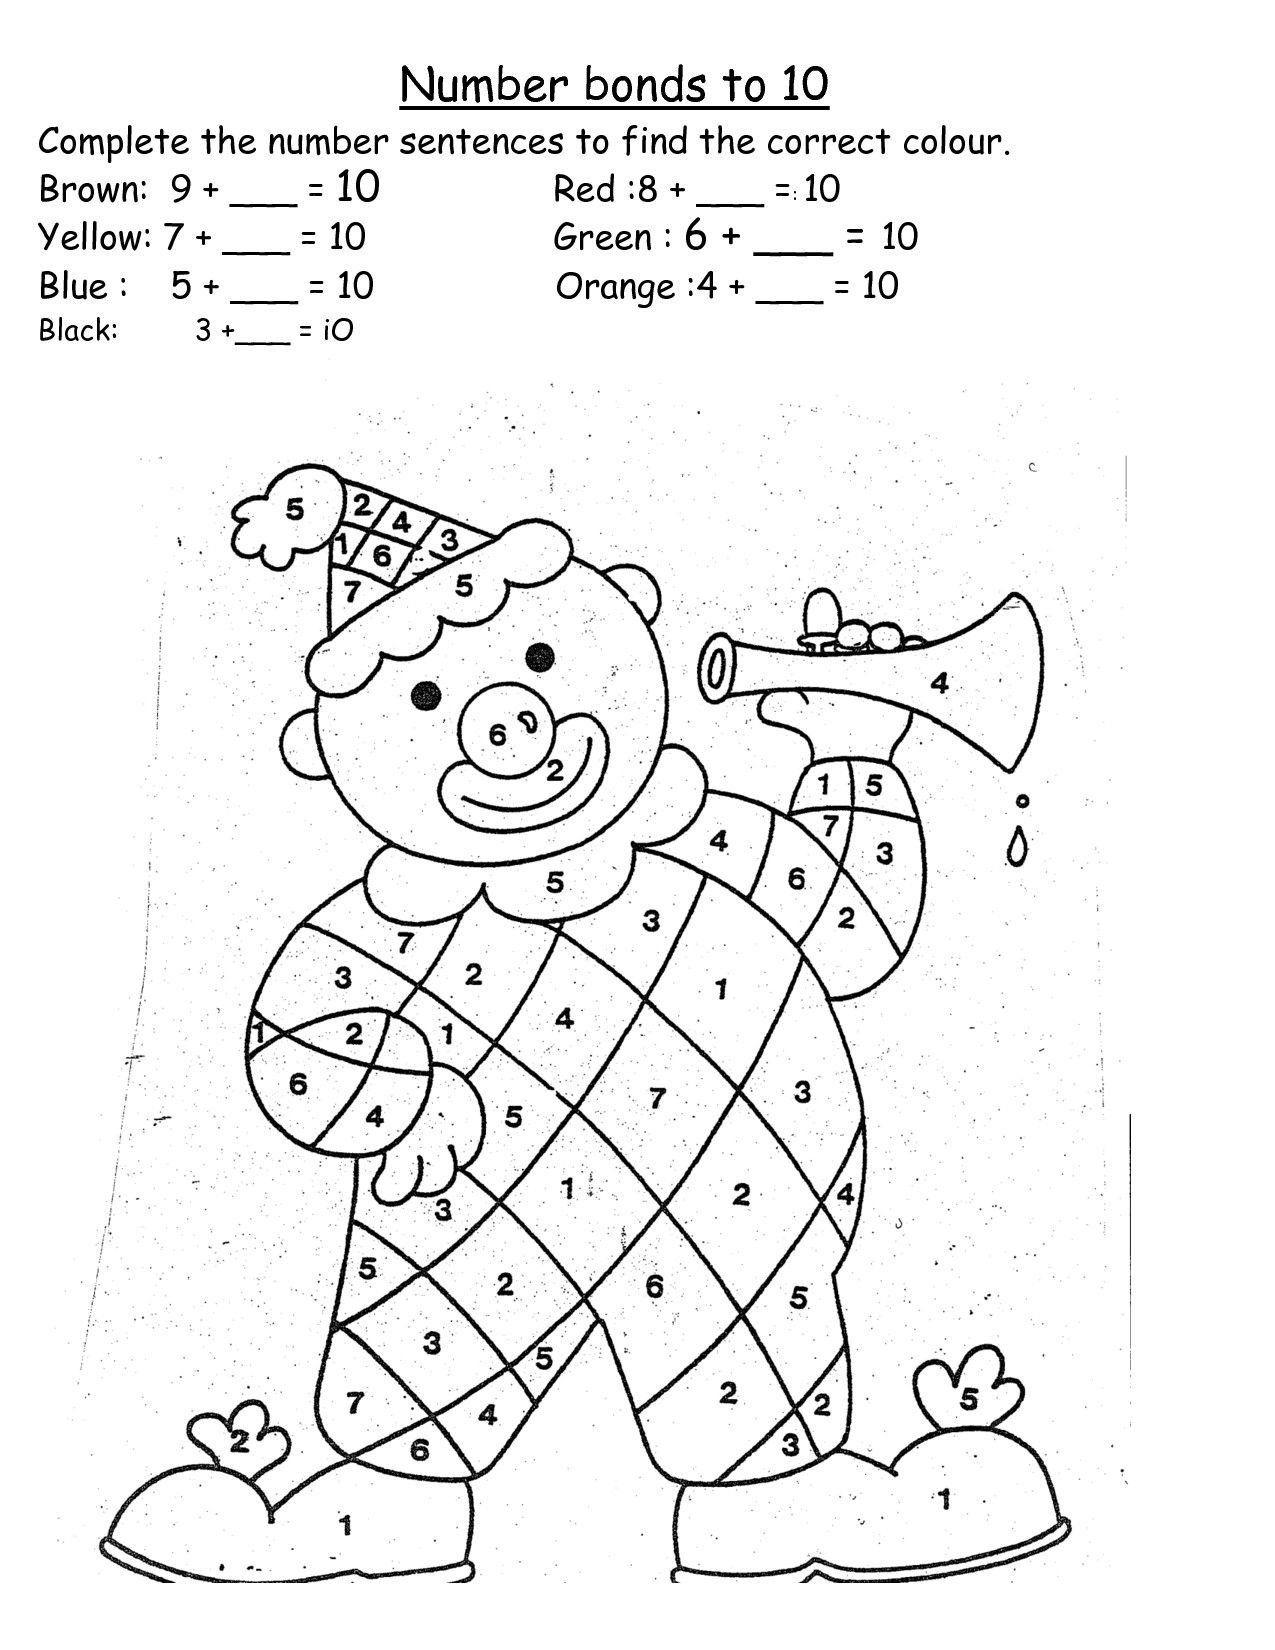 Number Bond Worksheets 2nd Grade Kumon Website 100th School Worksheets History Valentine Number Bonds Kindergarten Worksheets Number Bonds Worksheets [ 1650 x 1275 Pixel ]